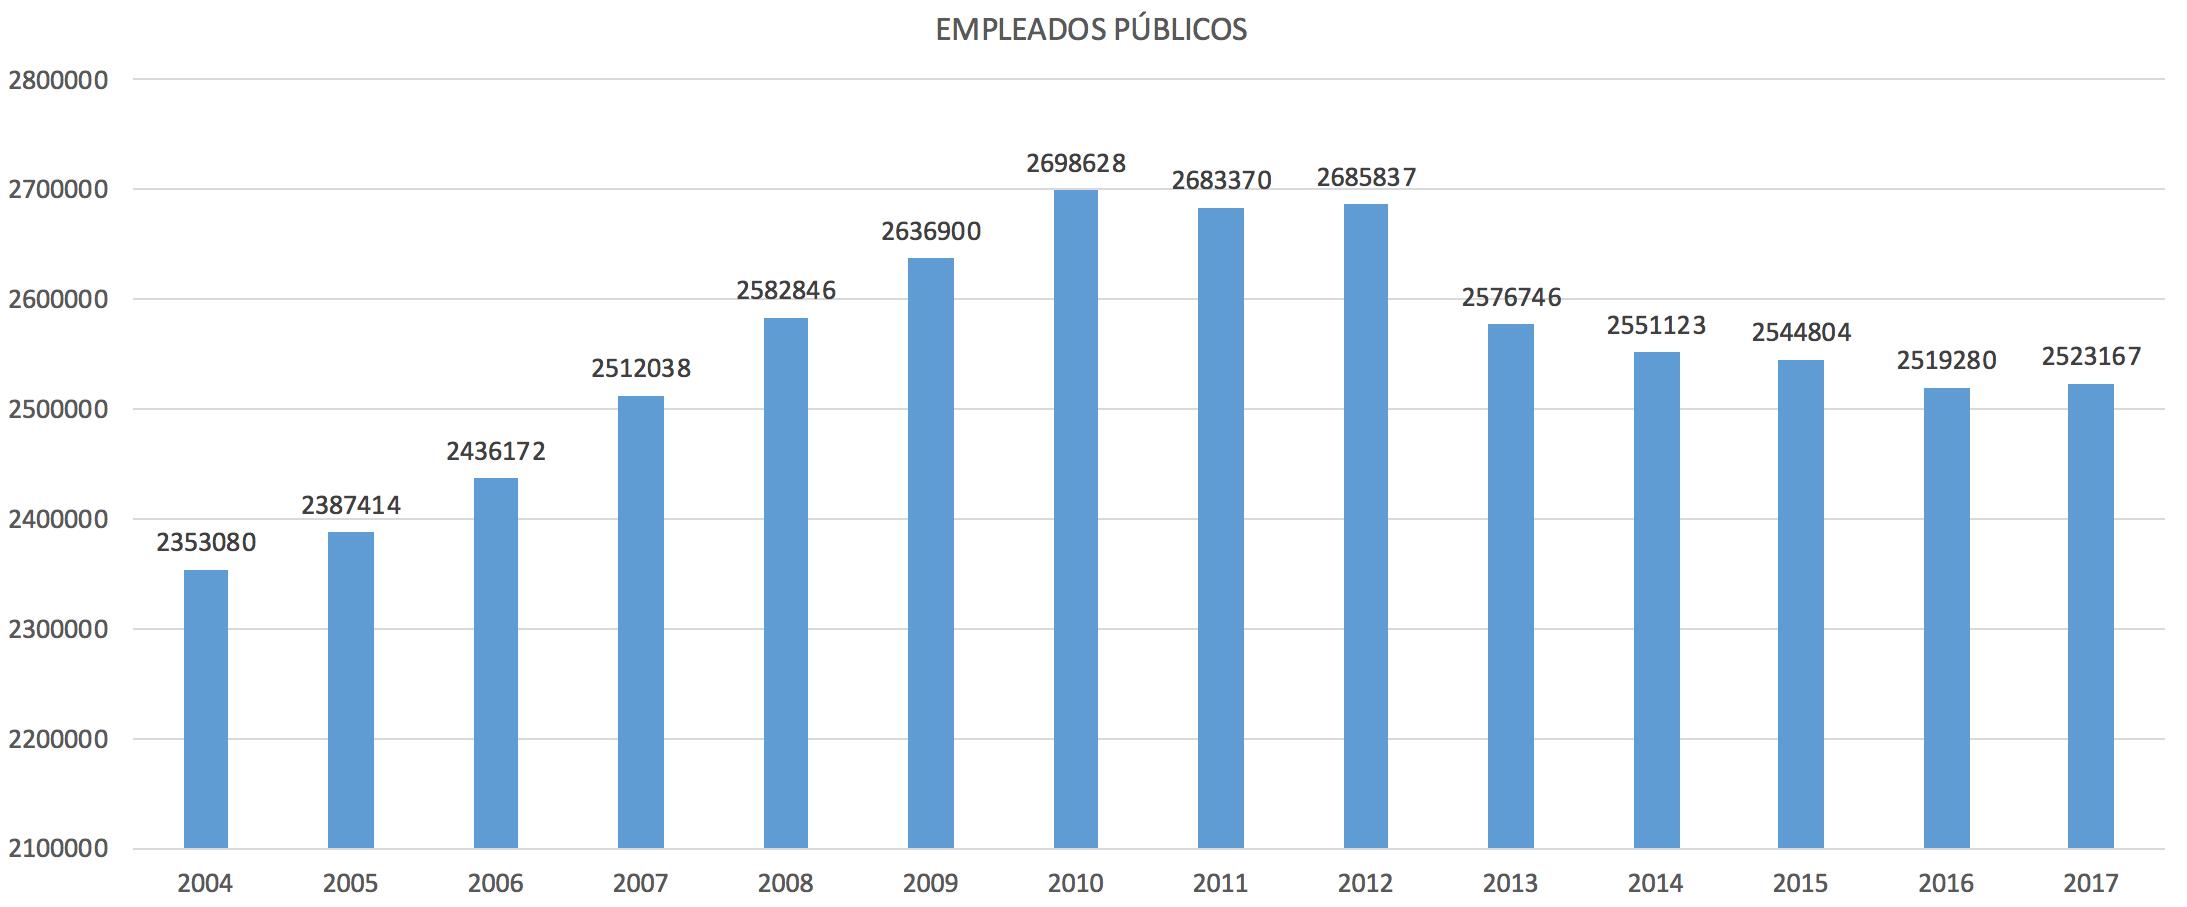 1-Total-empleados-publicos-espana.png